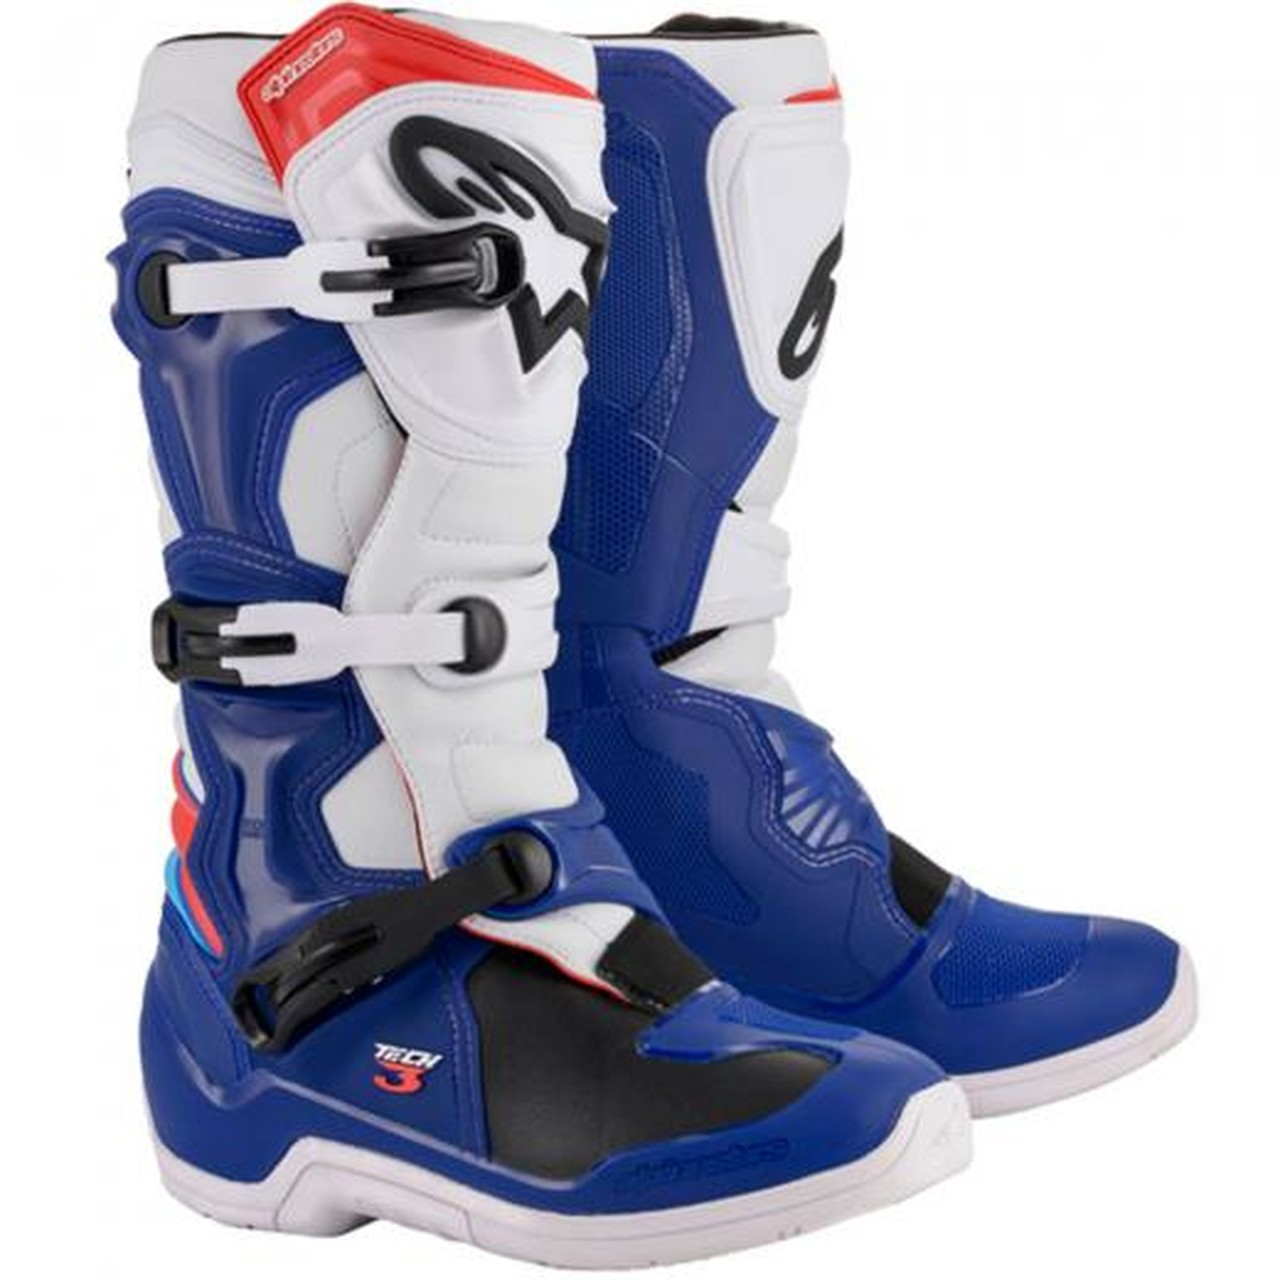 Bota Alpinestars Tech 3 - Azul/Branco